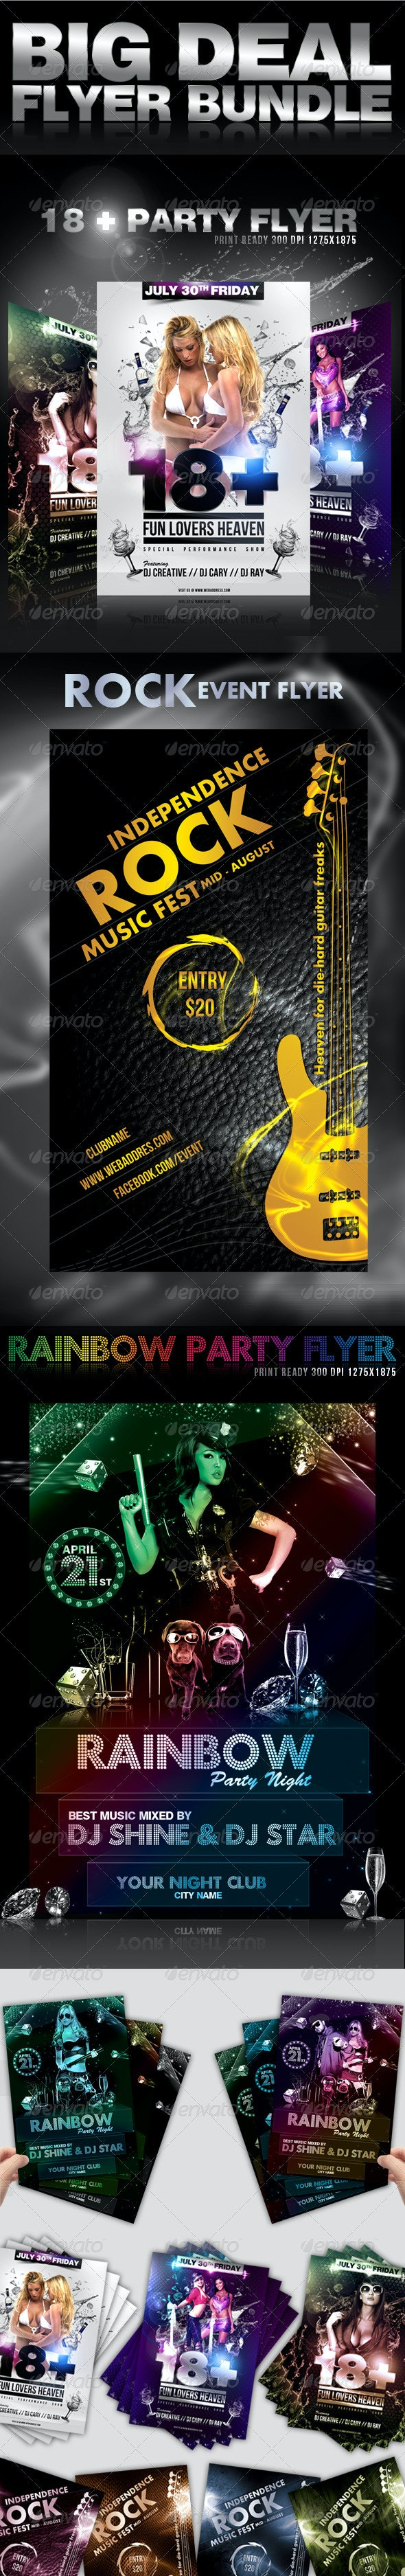 Big Deal Flyer Bundle - Clubs & Parties Events